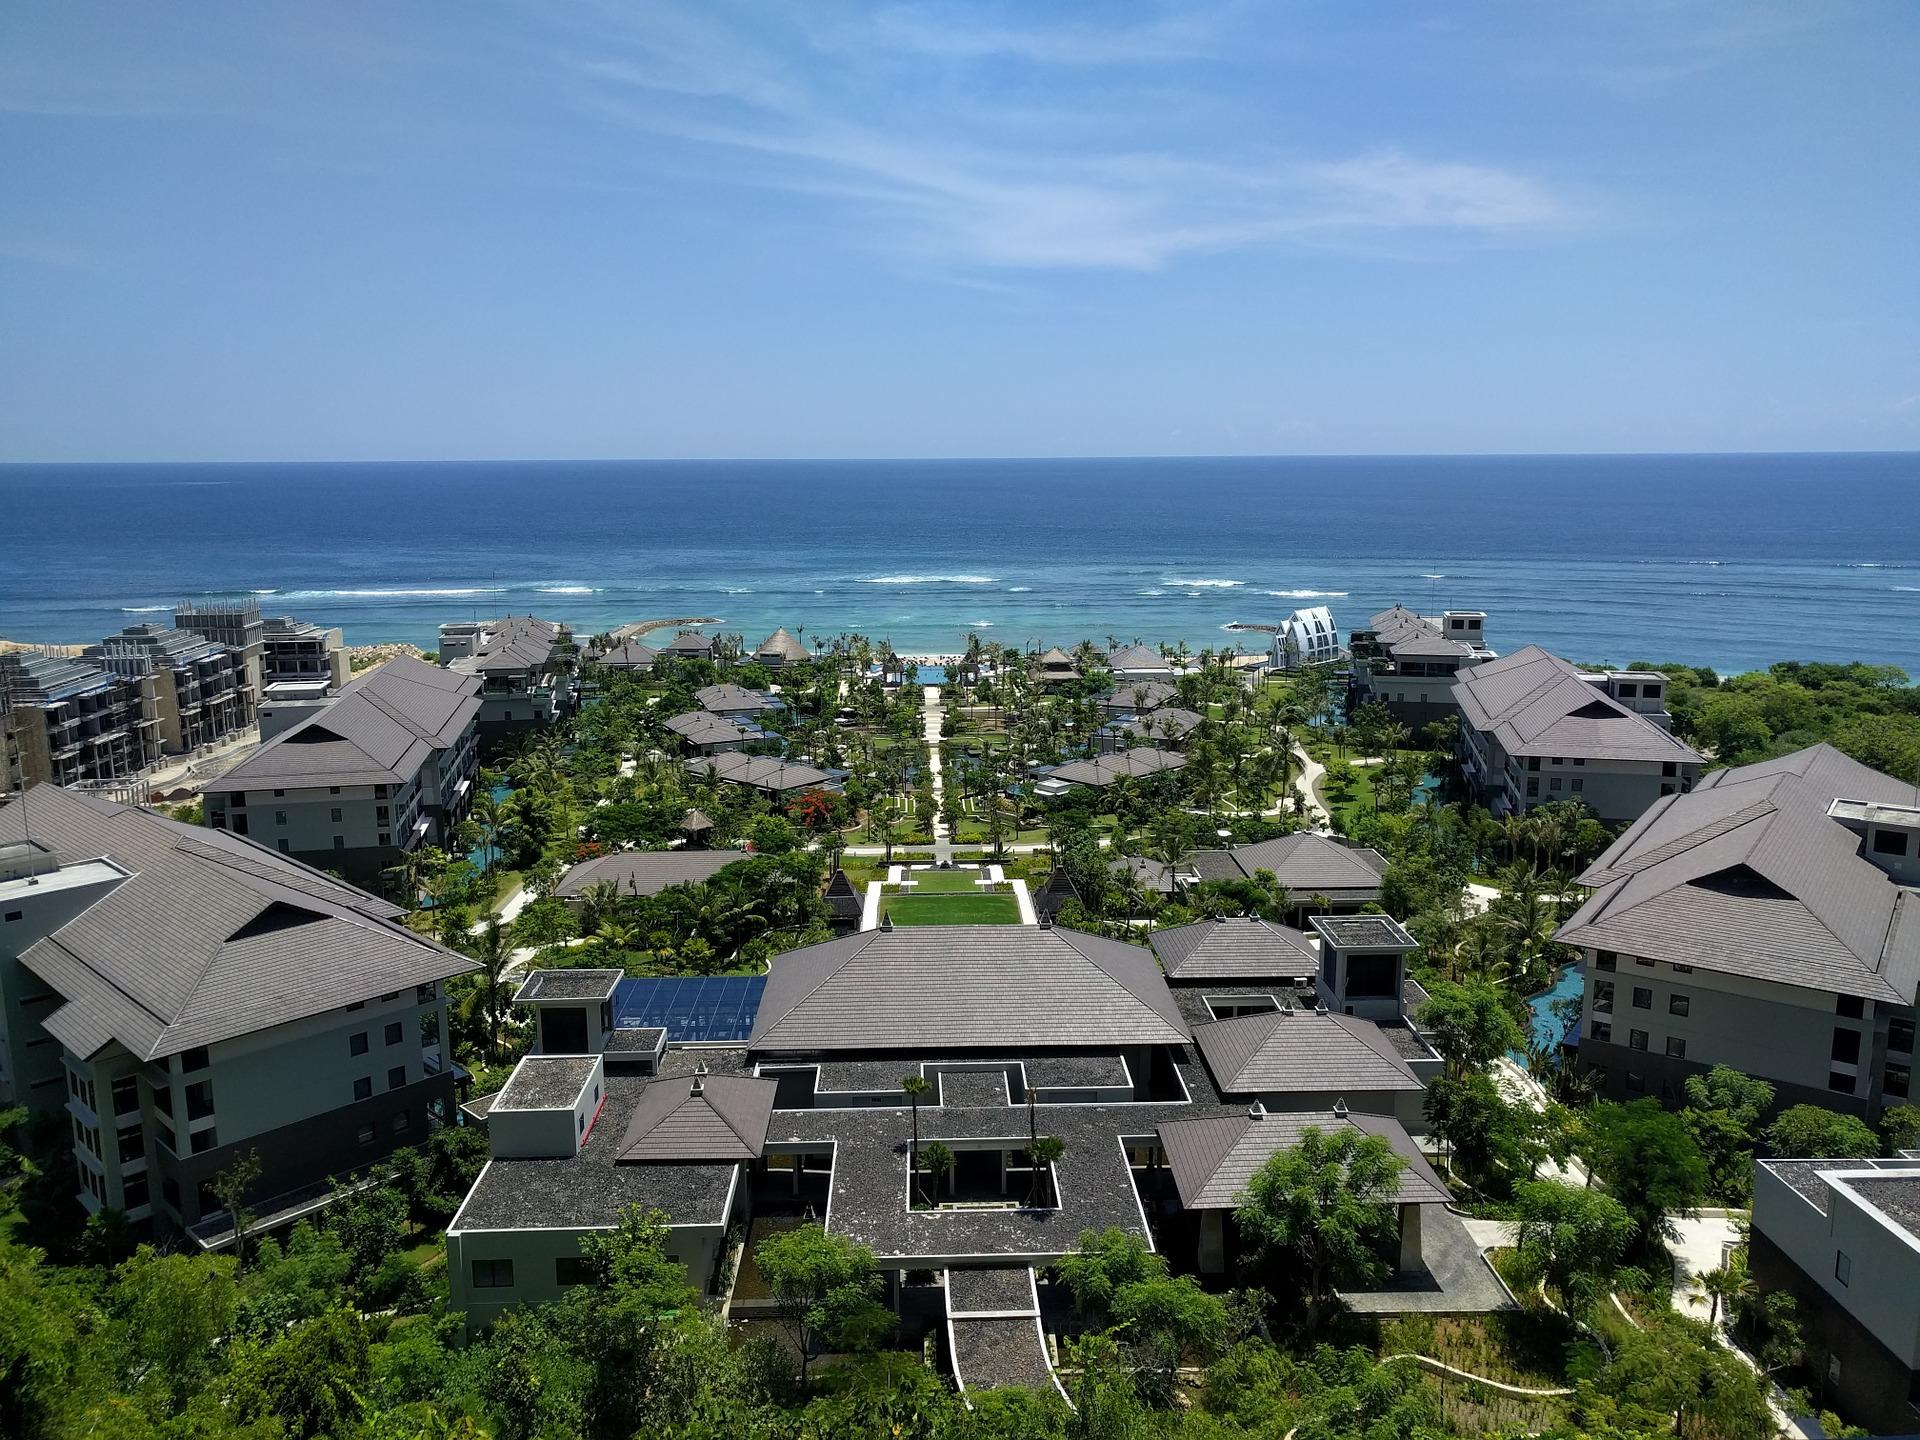 Hotels in Bali, Indonesia